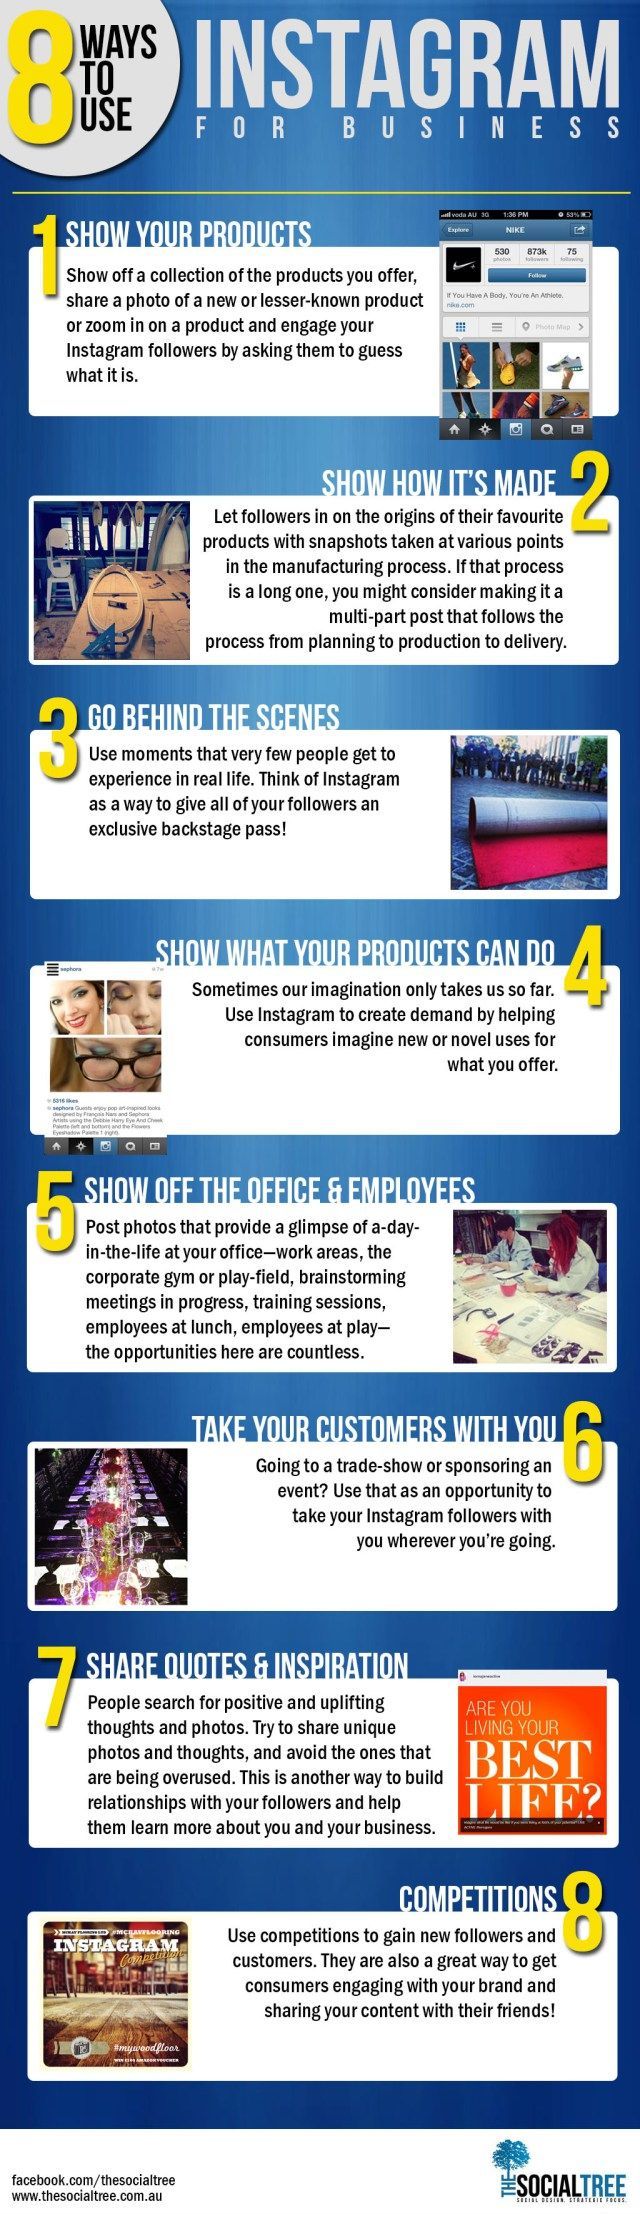 8 ways to use Instagram #infografia #infographic #socialmedia